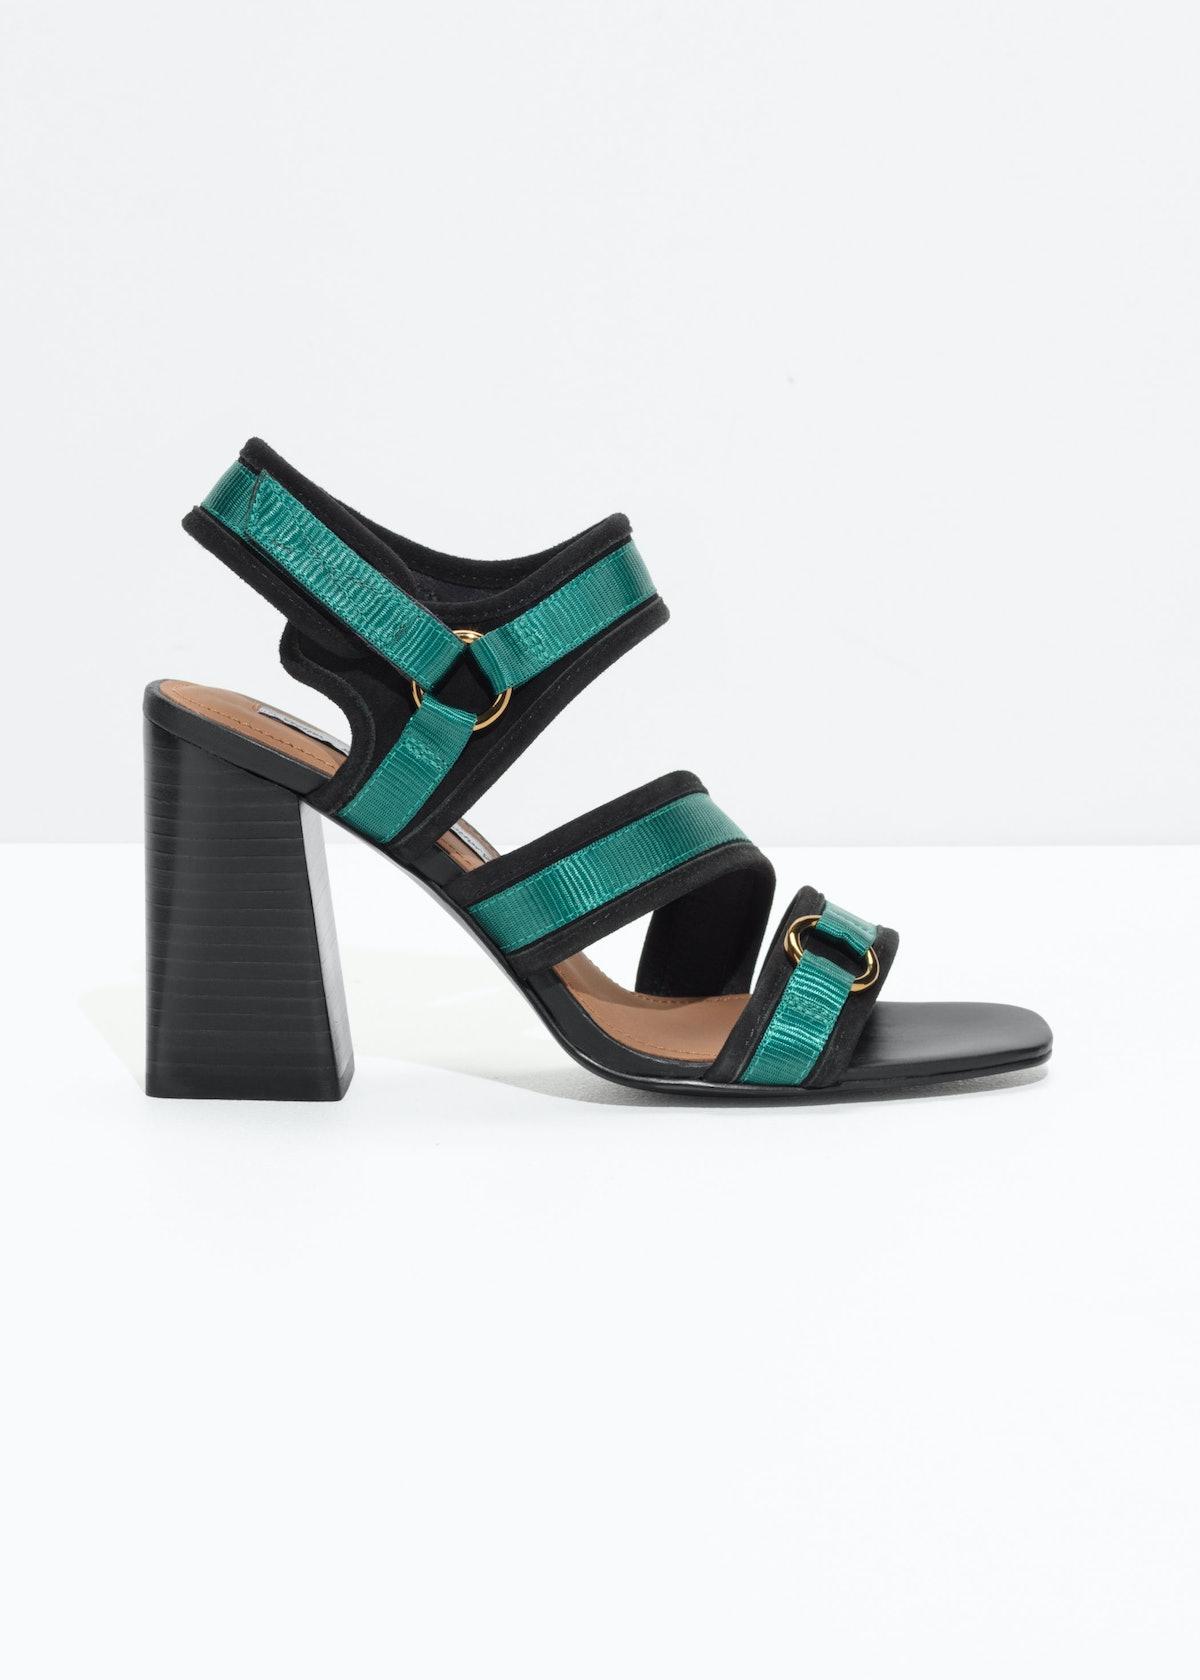 Square Toe Heeled Sandals